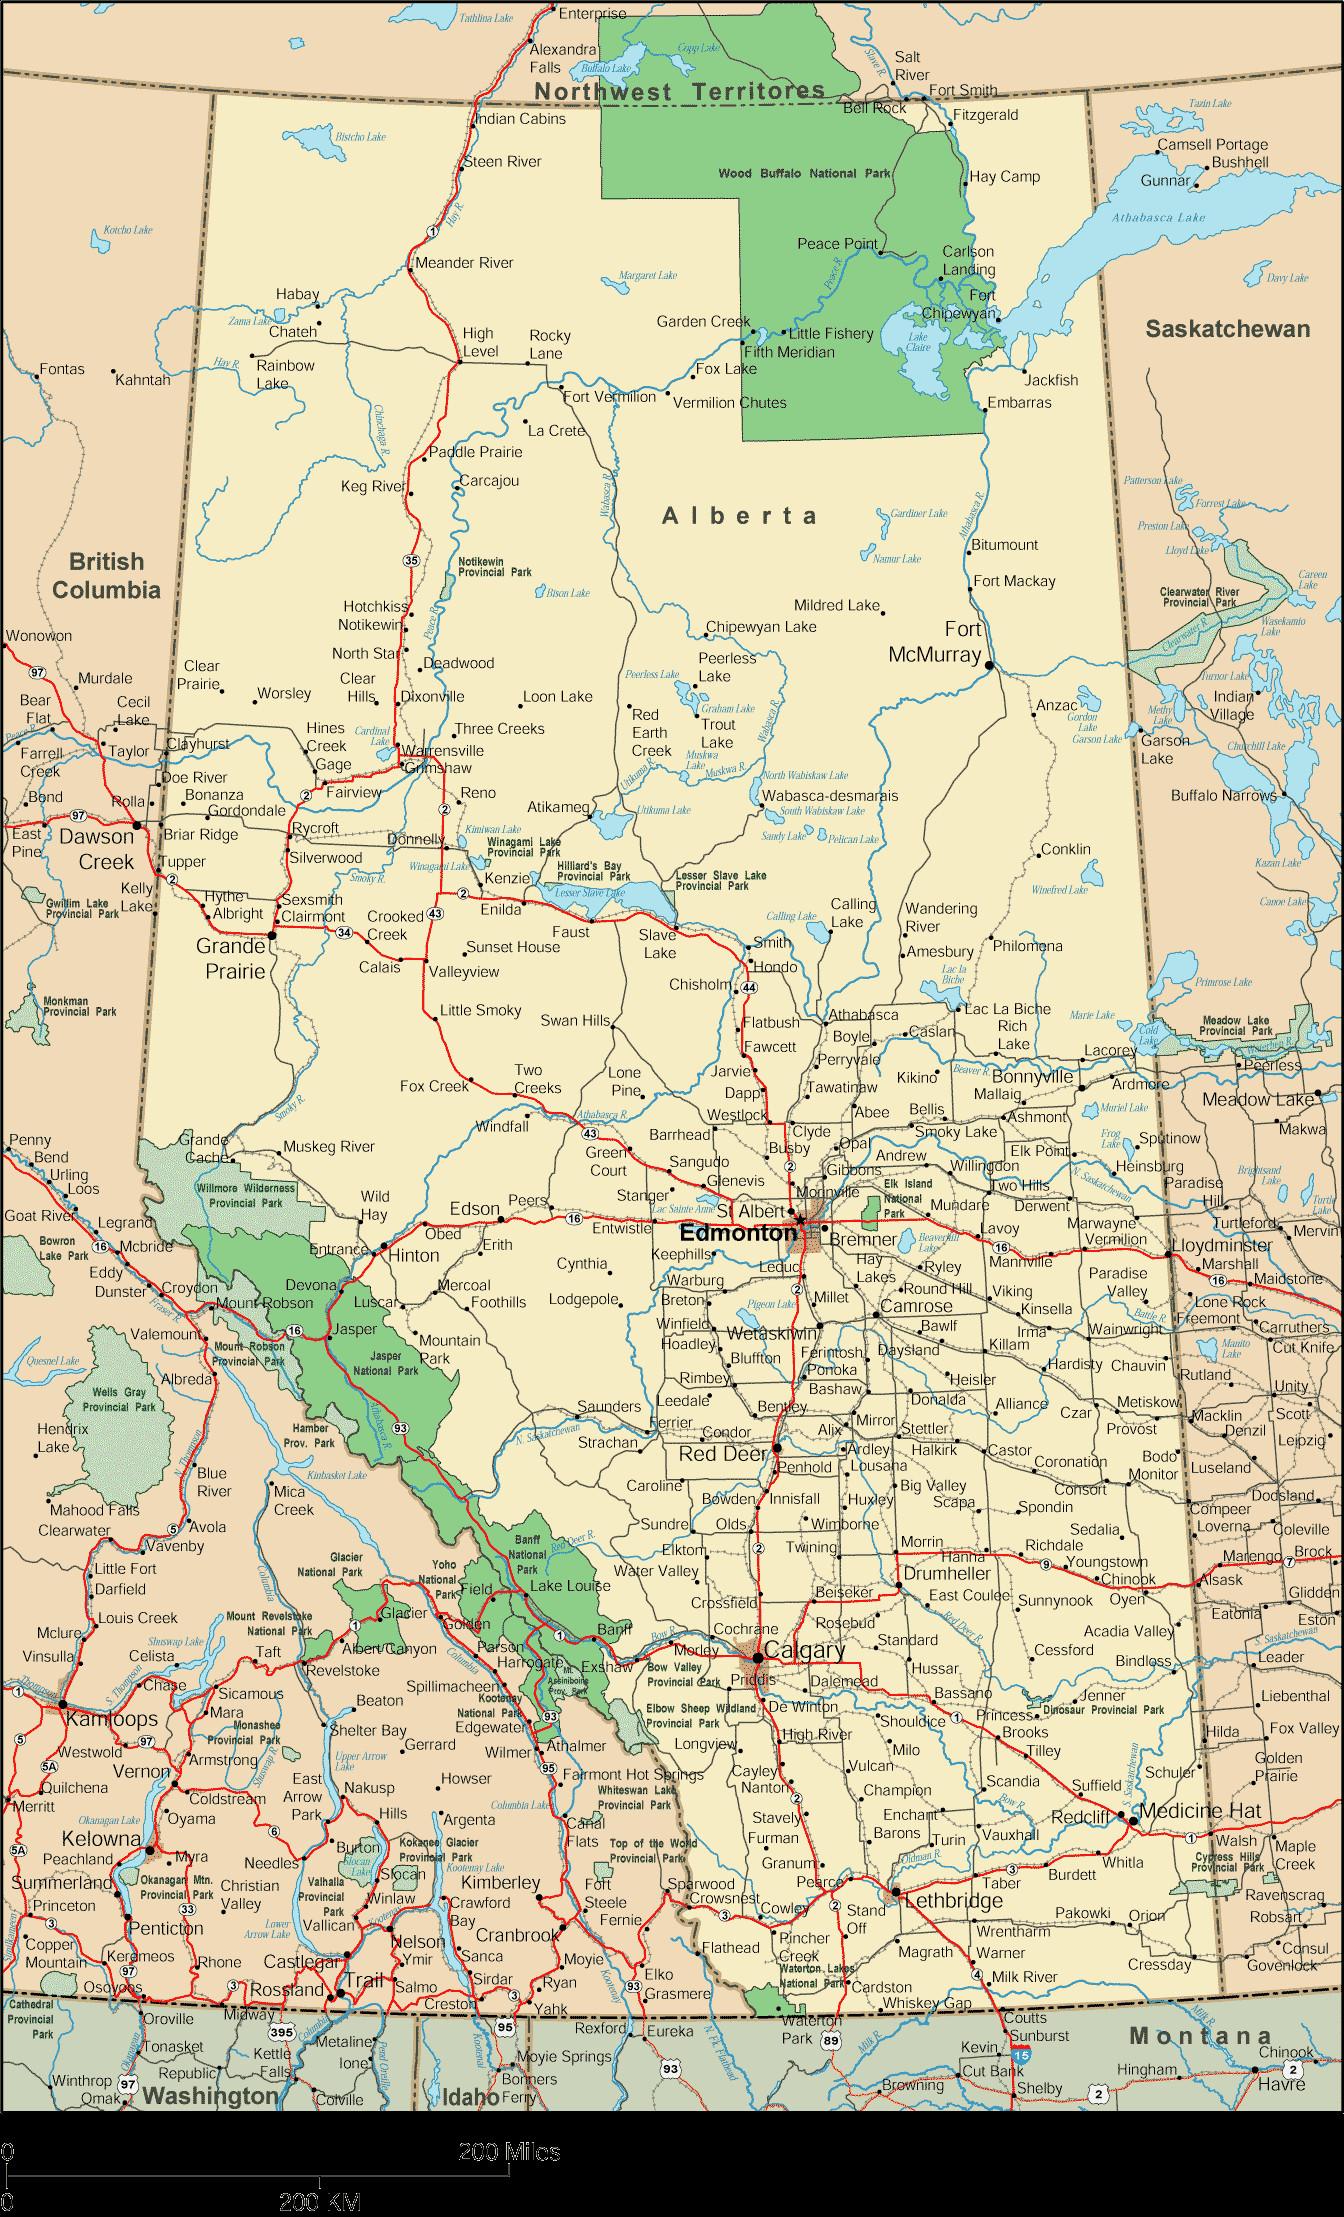 Road Map Of Baja California Mexico Printable Alberta Map Alberta - Printable Road Map Of Canada